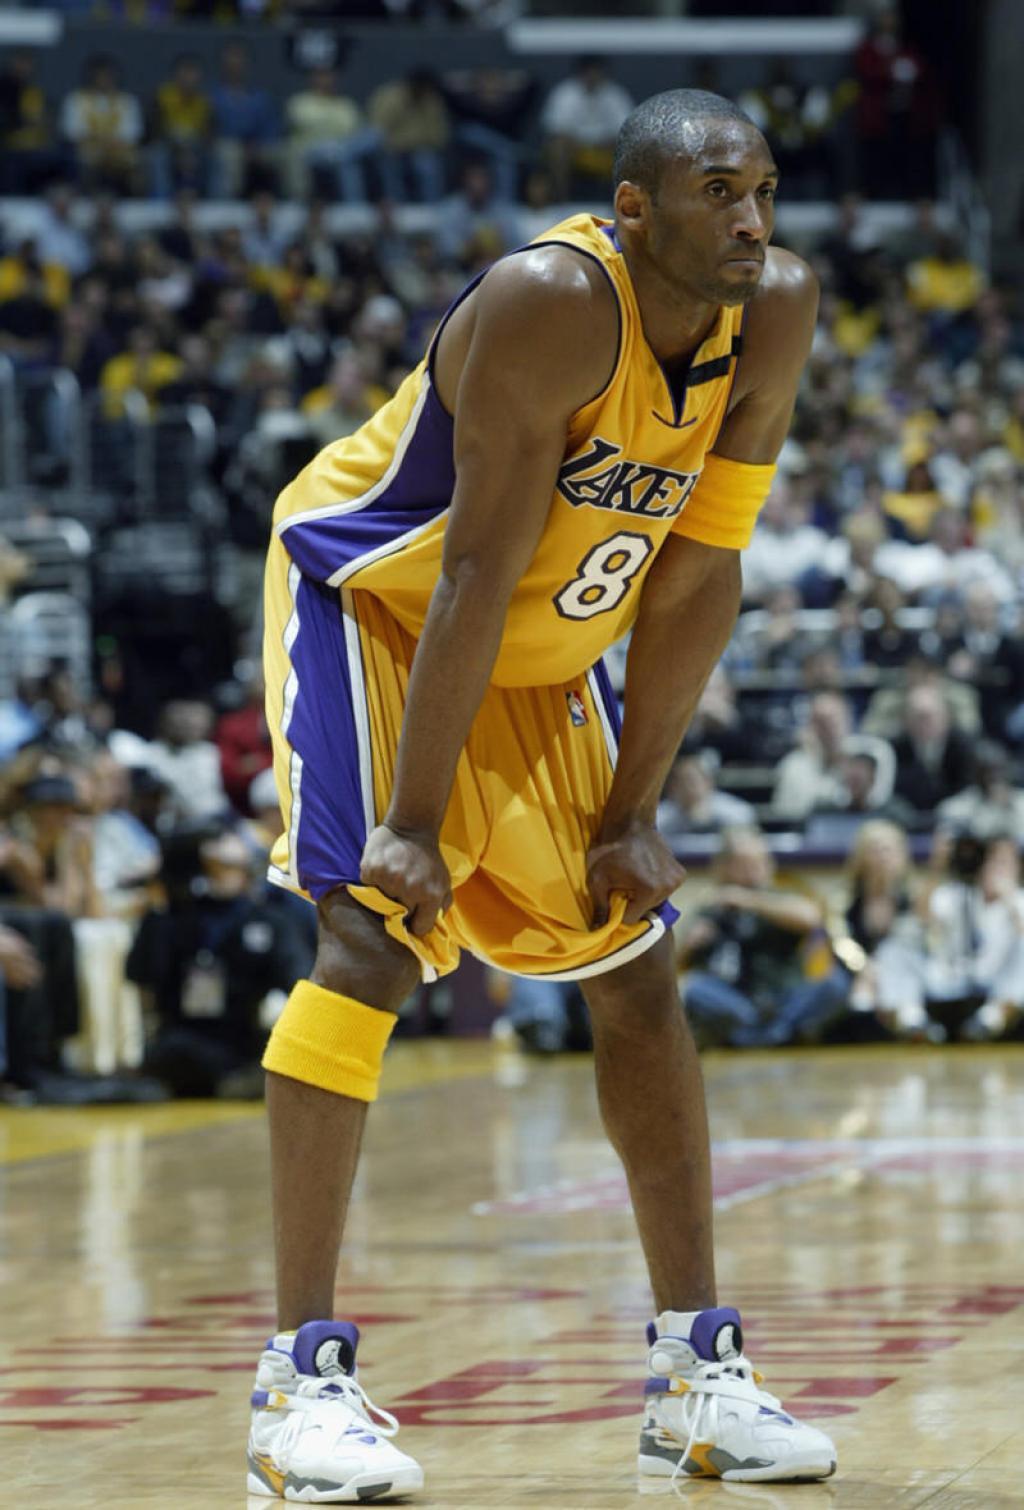 pretty nice 9c56f 4cc8d Every Sneaker Kobe Bryant Played In | Nice Kicks